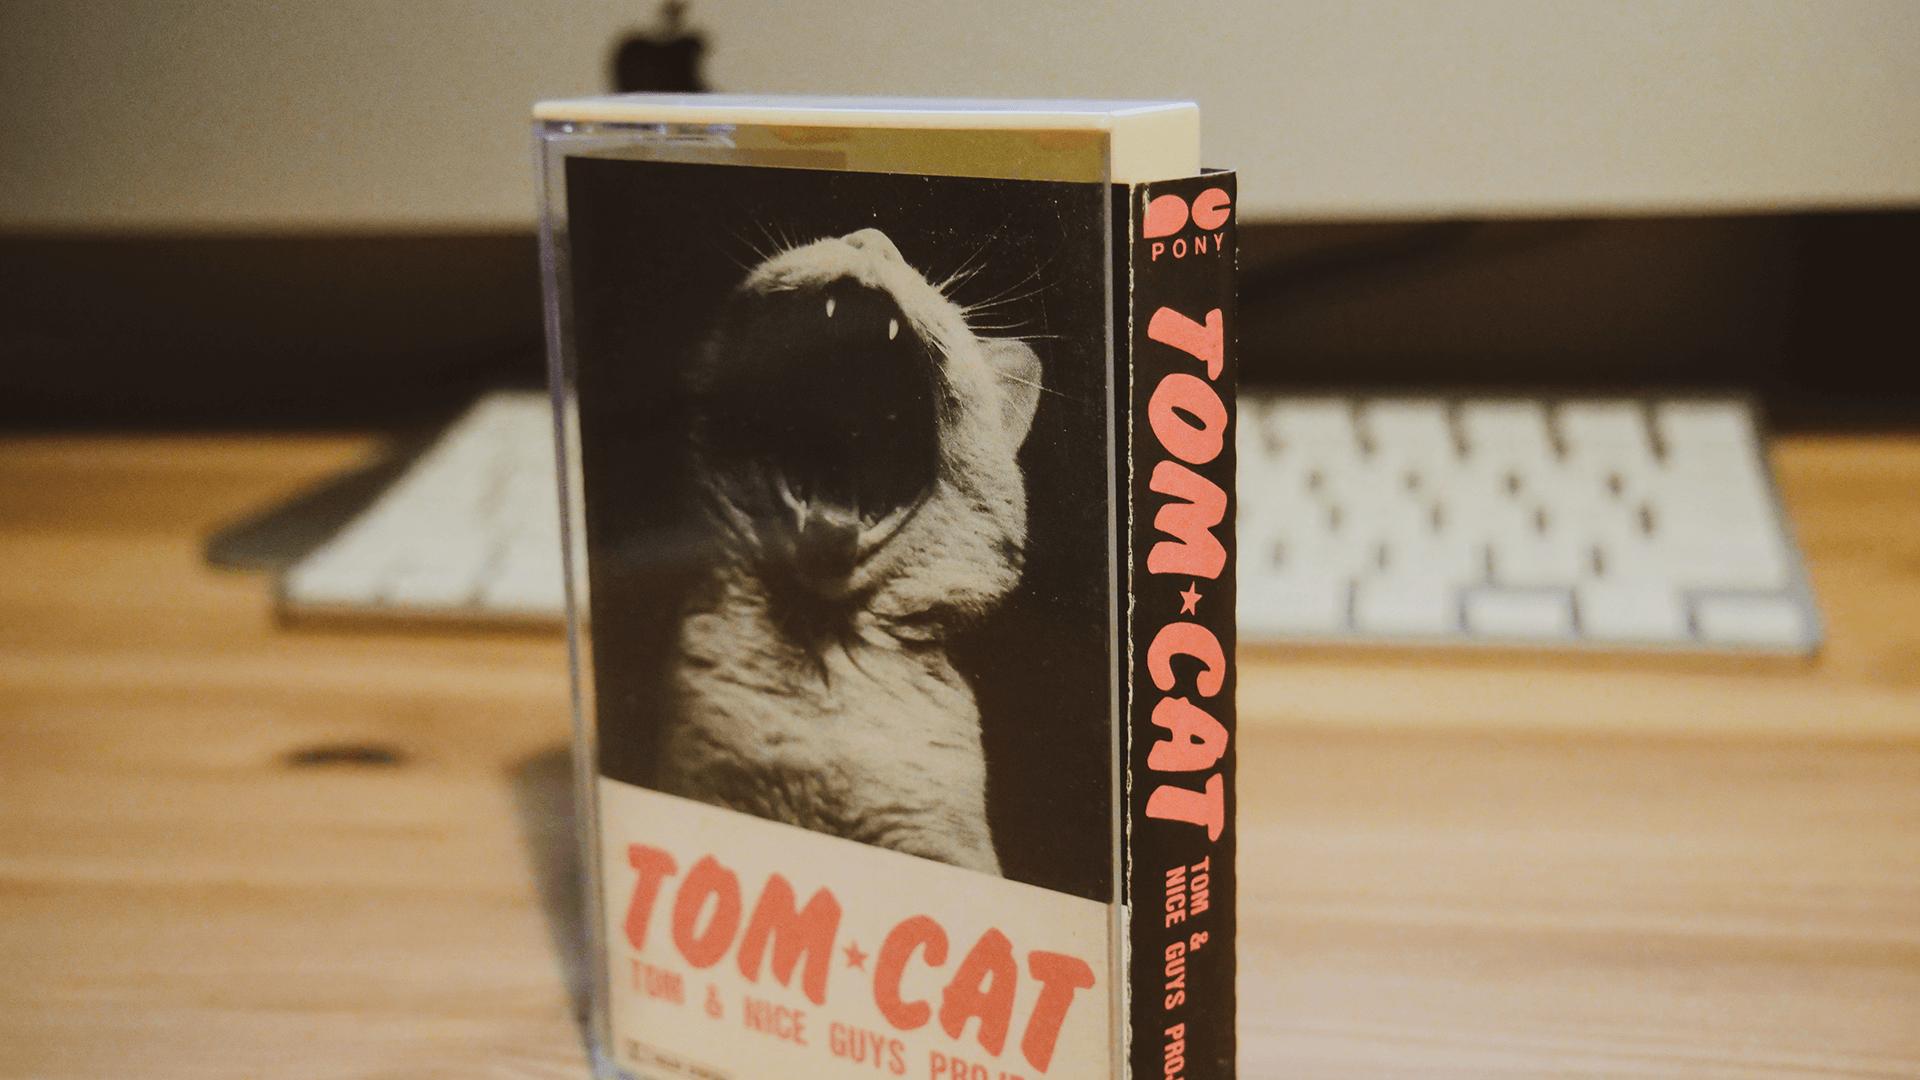 TOM CATのカセットテープジャケット